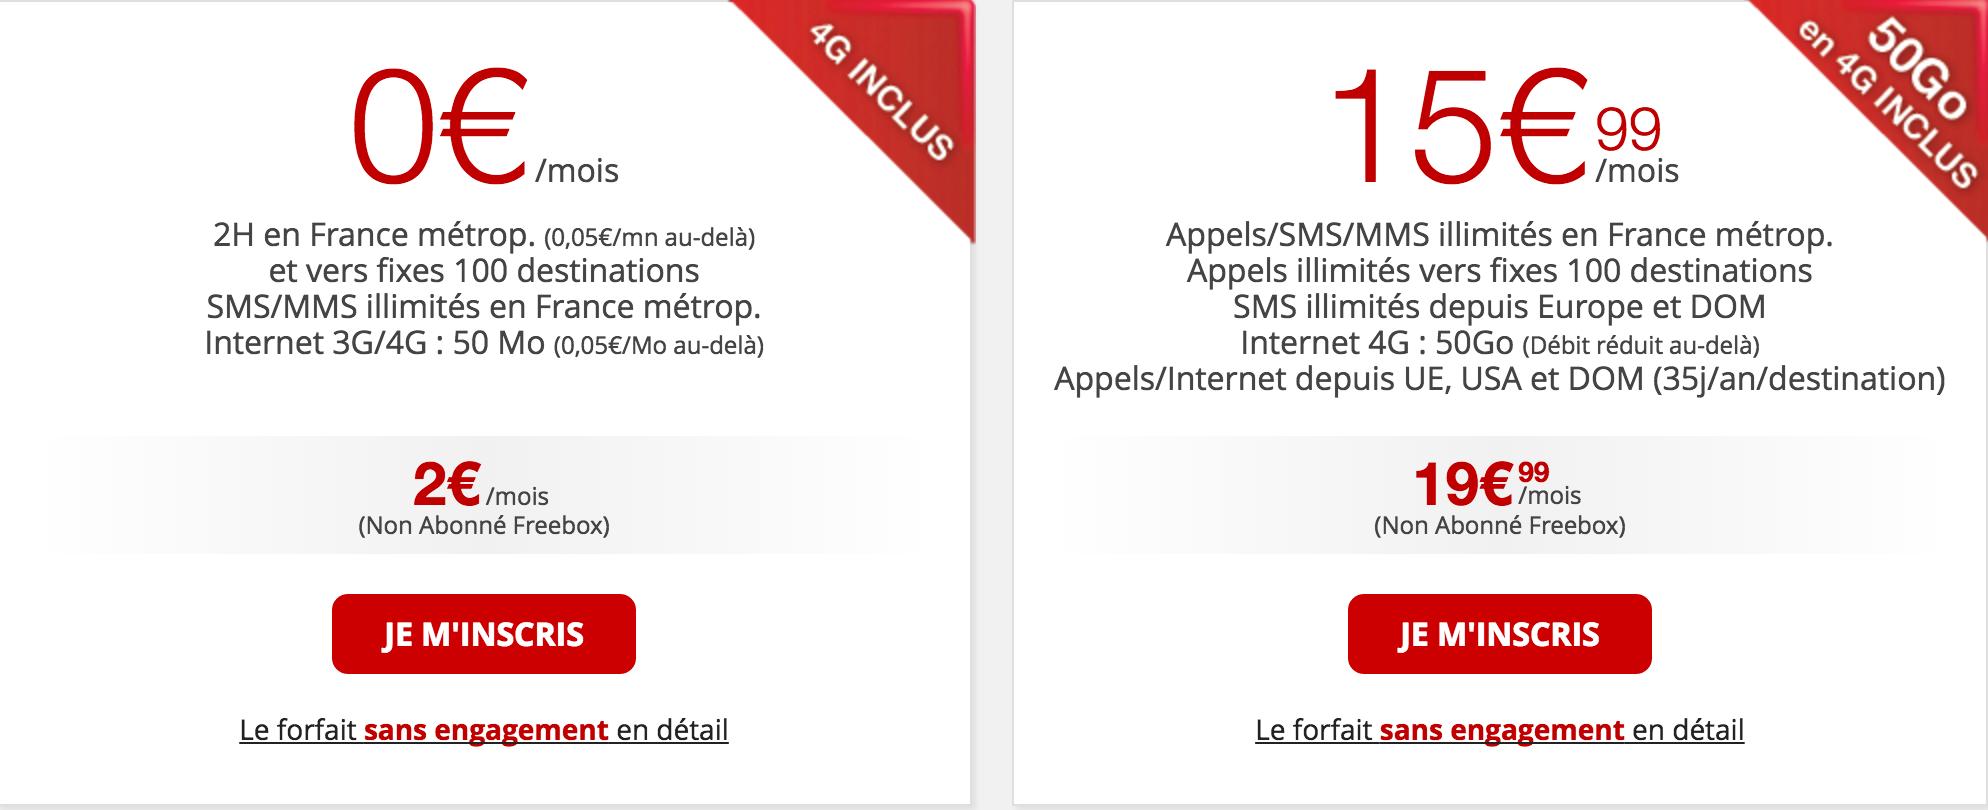 free mobile offerta